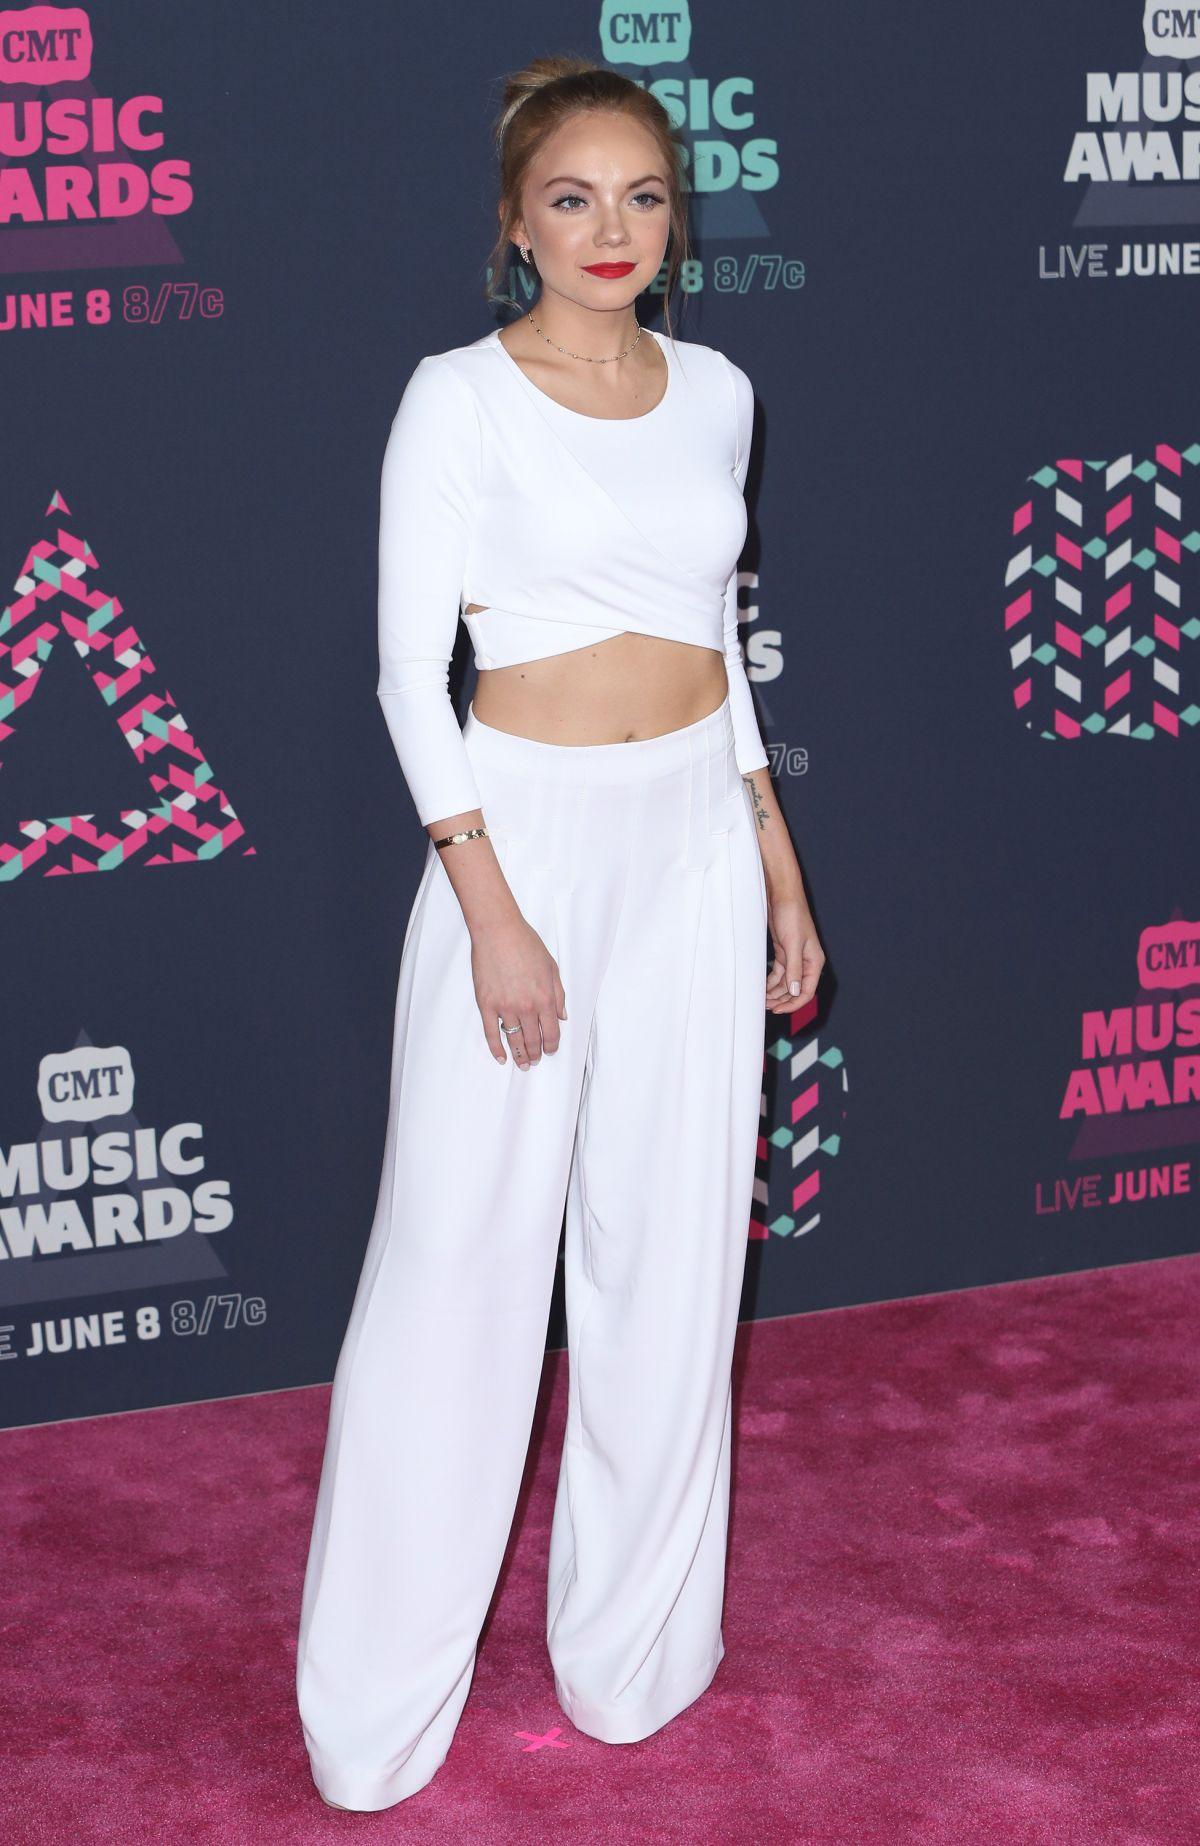 DANIELLE BRADBERY at 2016 CMT Music Awards in Nashville 06/08/2016